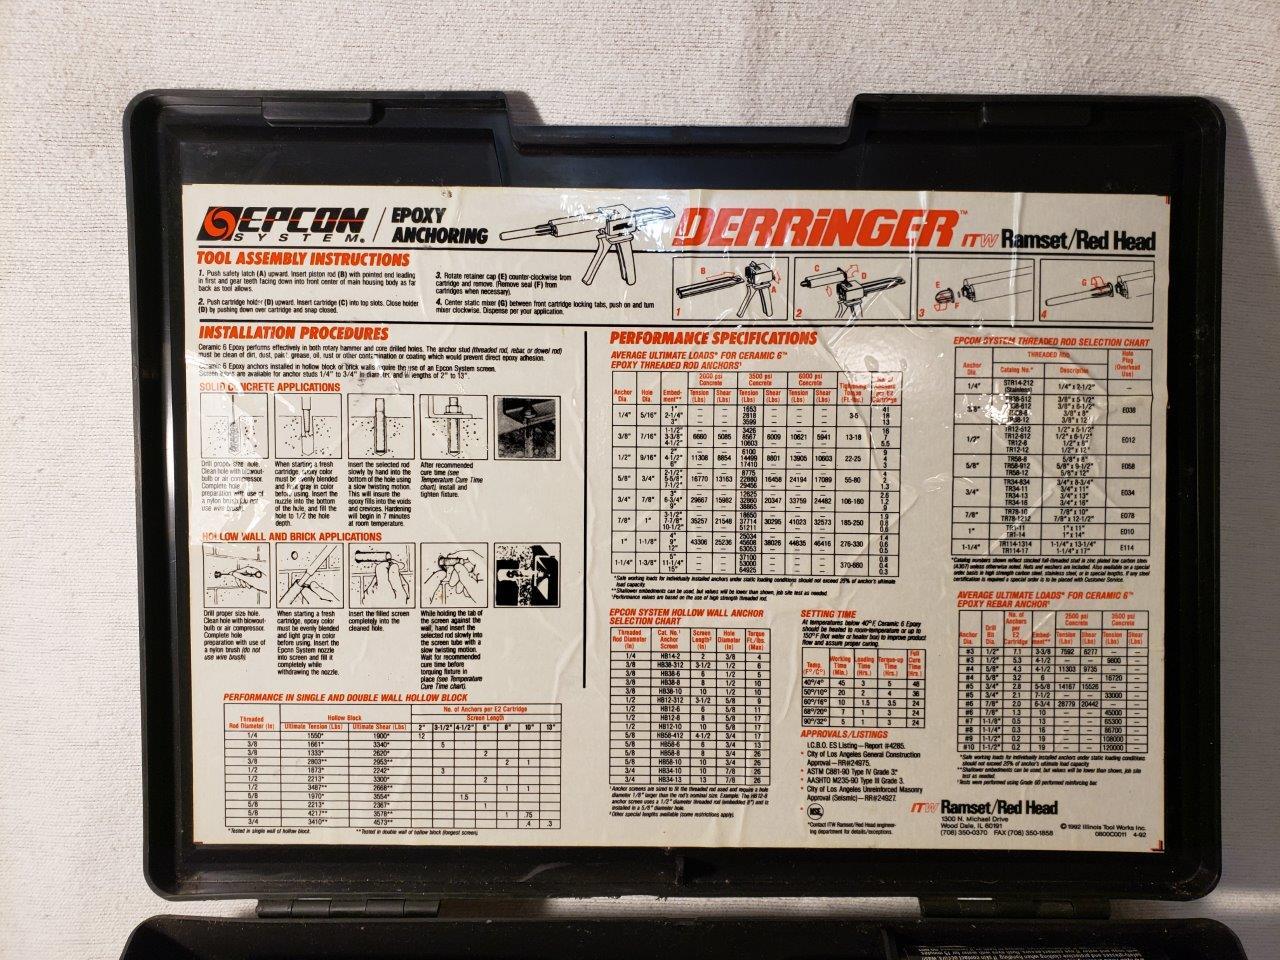 Epcon Derringer ITW Ramset Redhead Epoxy Anchoring System KIT chemical concrete dispenser Cartridge gun